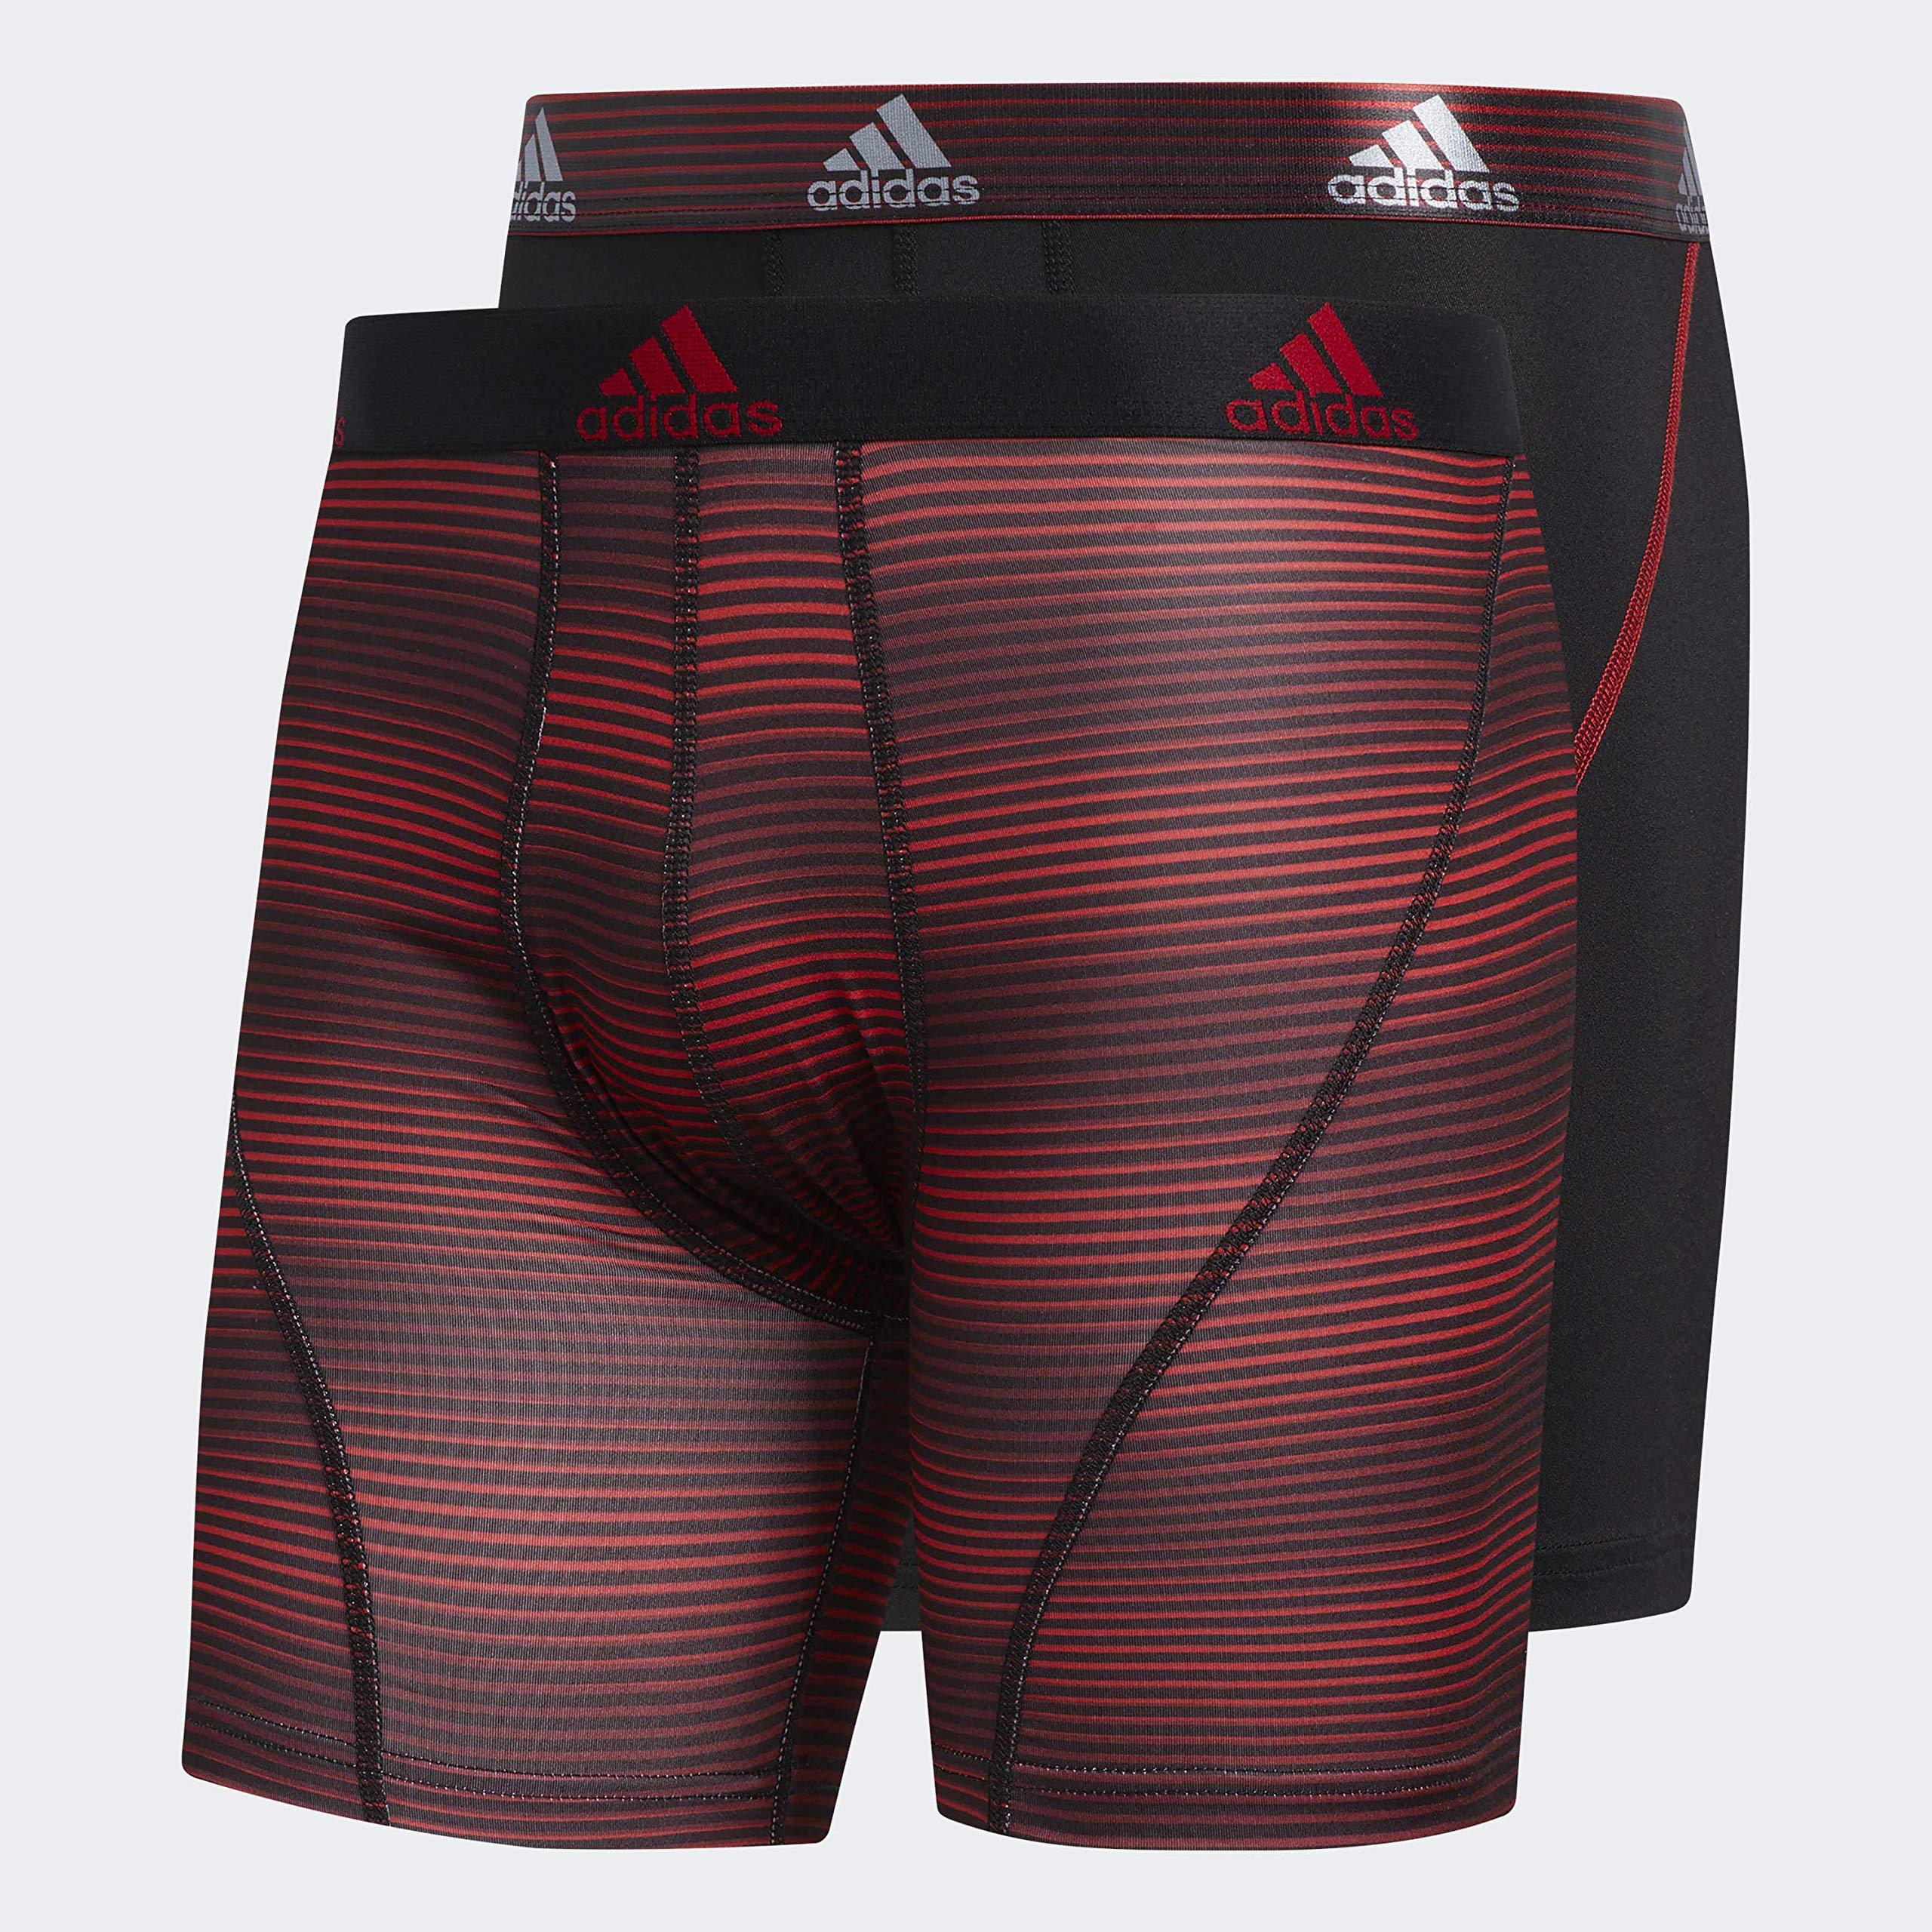 adidas Men's Sport Performance Boxer Briefs Underwear (2 Pack), Sundown Scarlet Black/Scarlet, SMALL by adidas